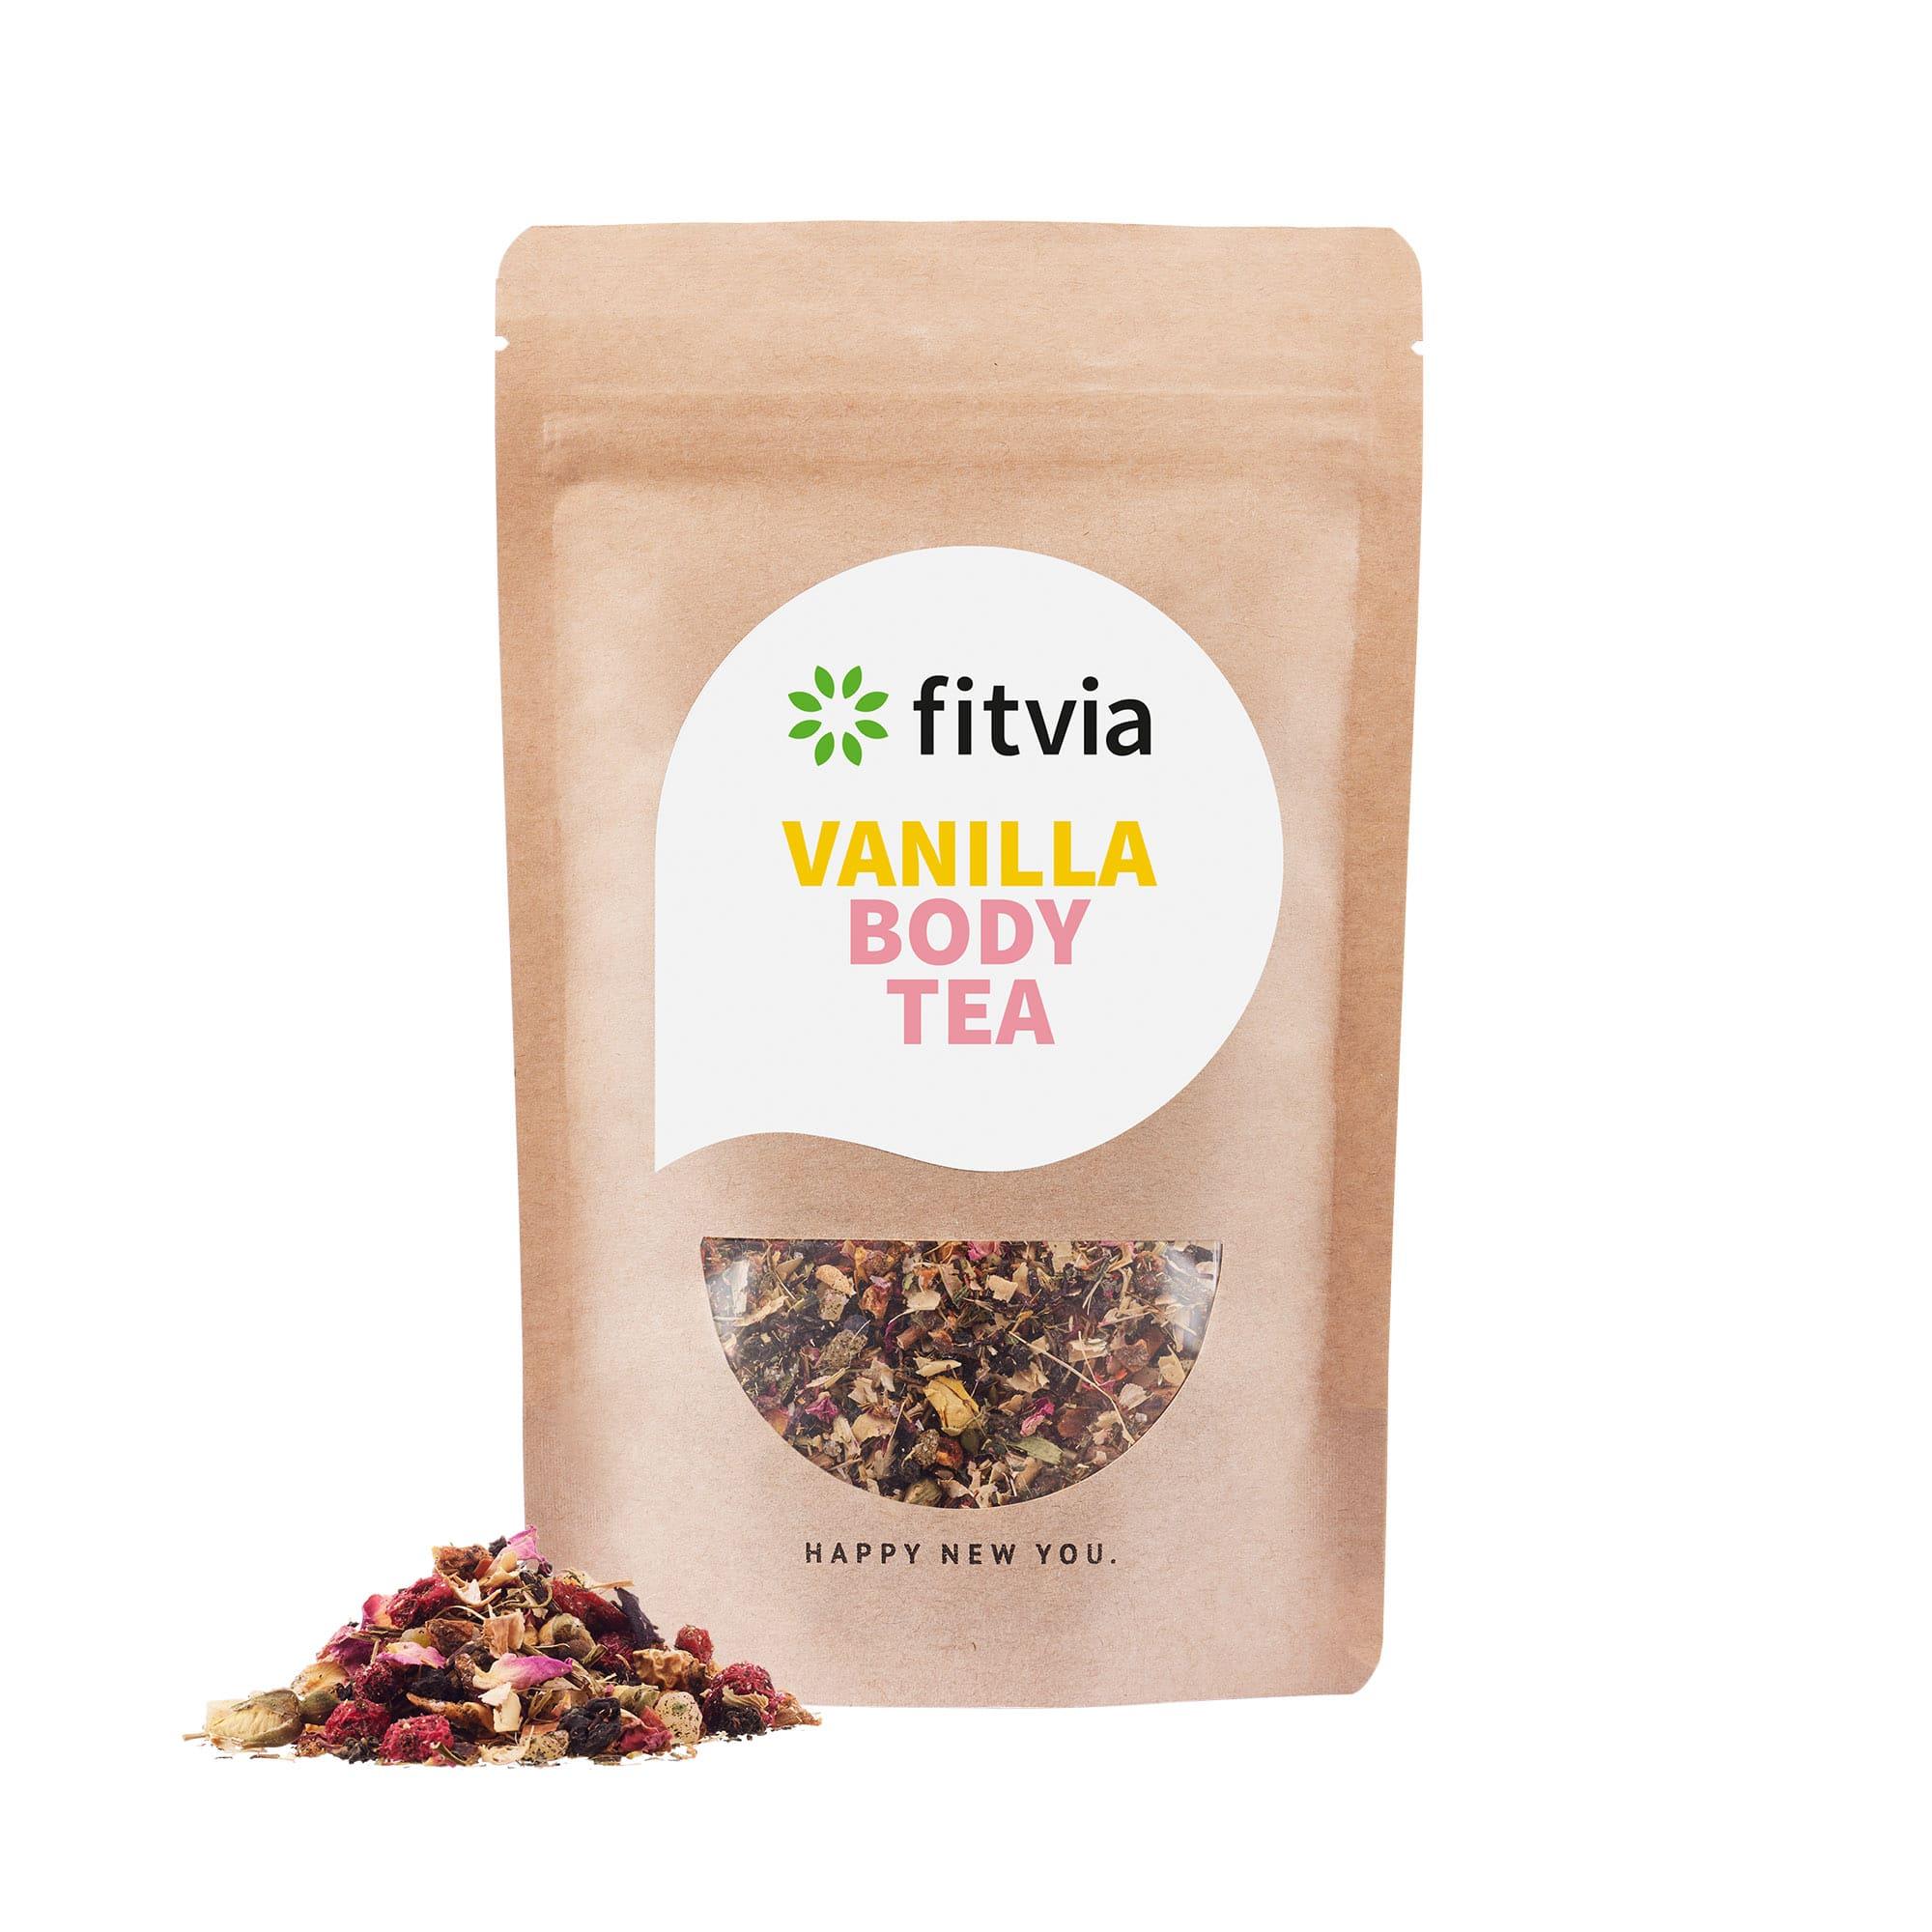 fitvia- Berry Body Box - Abnehmen mit leckeren Produkten?!